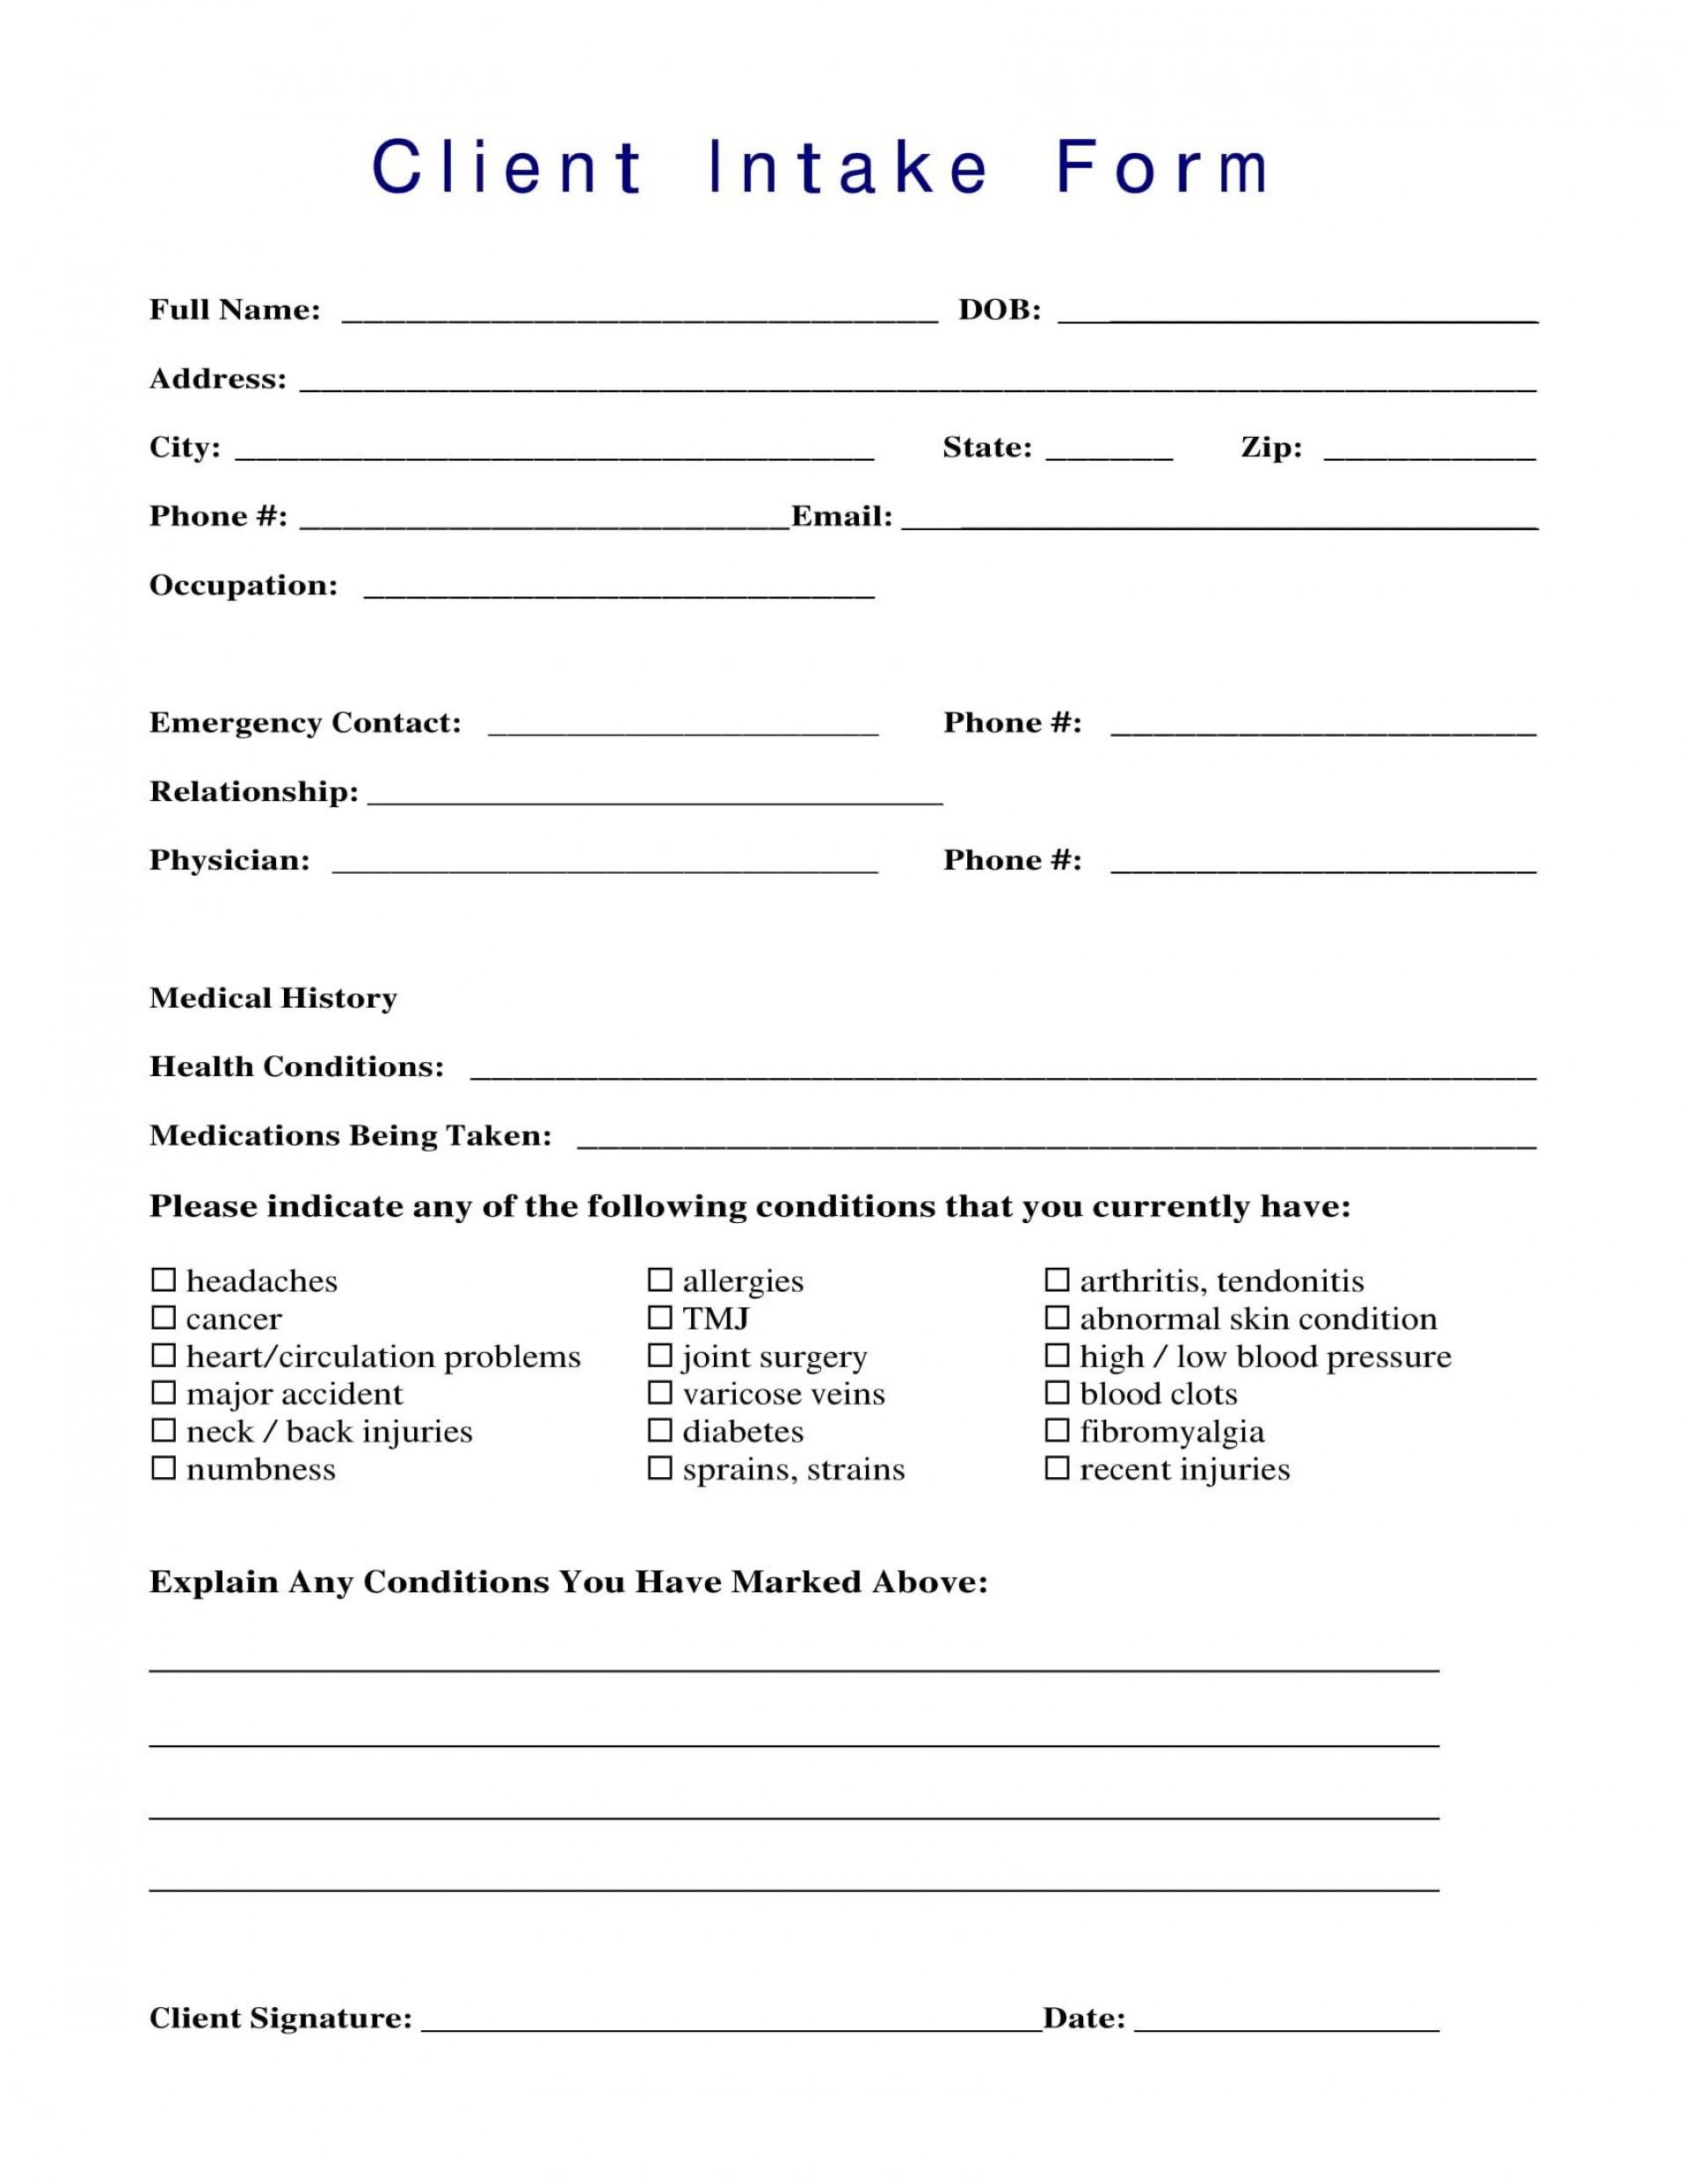 002 Marvelou Patient Intake Form Template Design  Word Client Excel Pdf1920